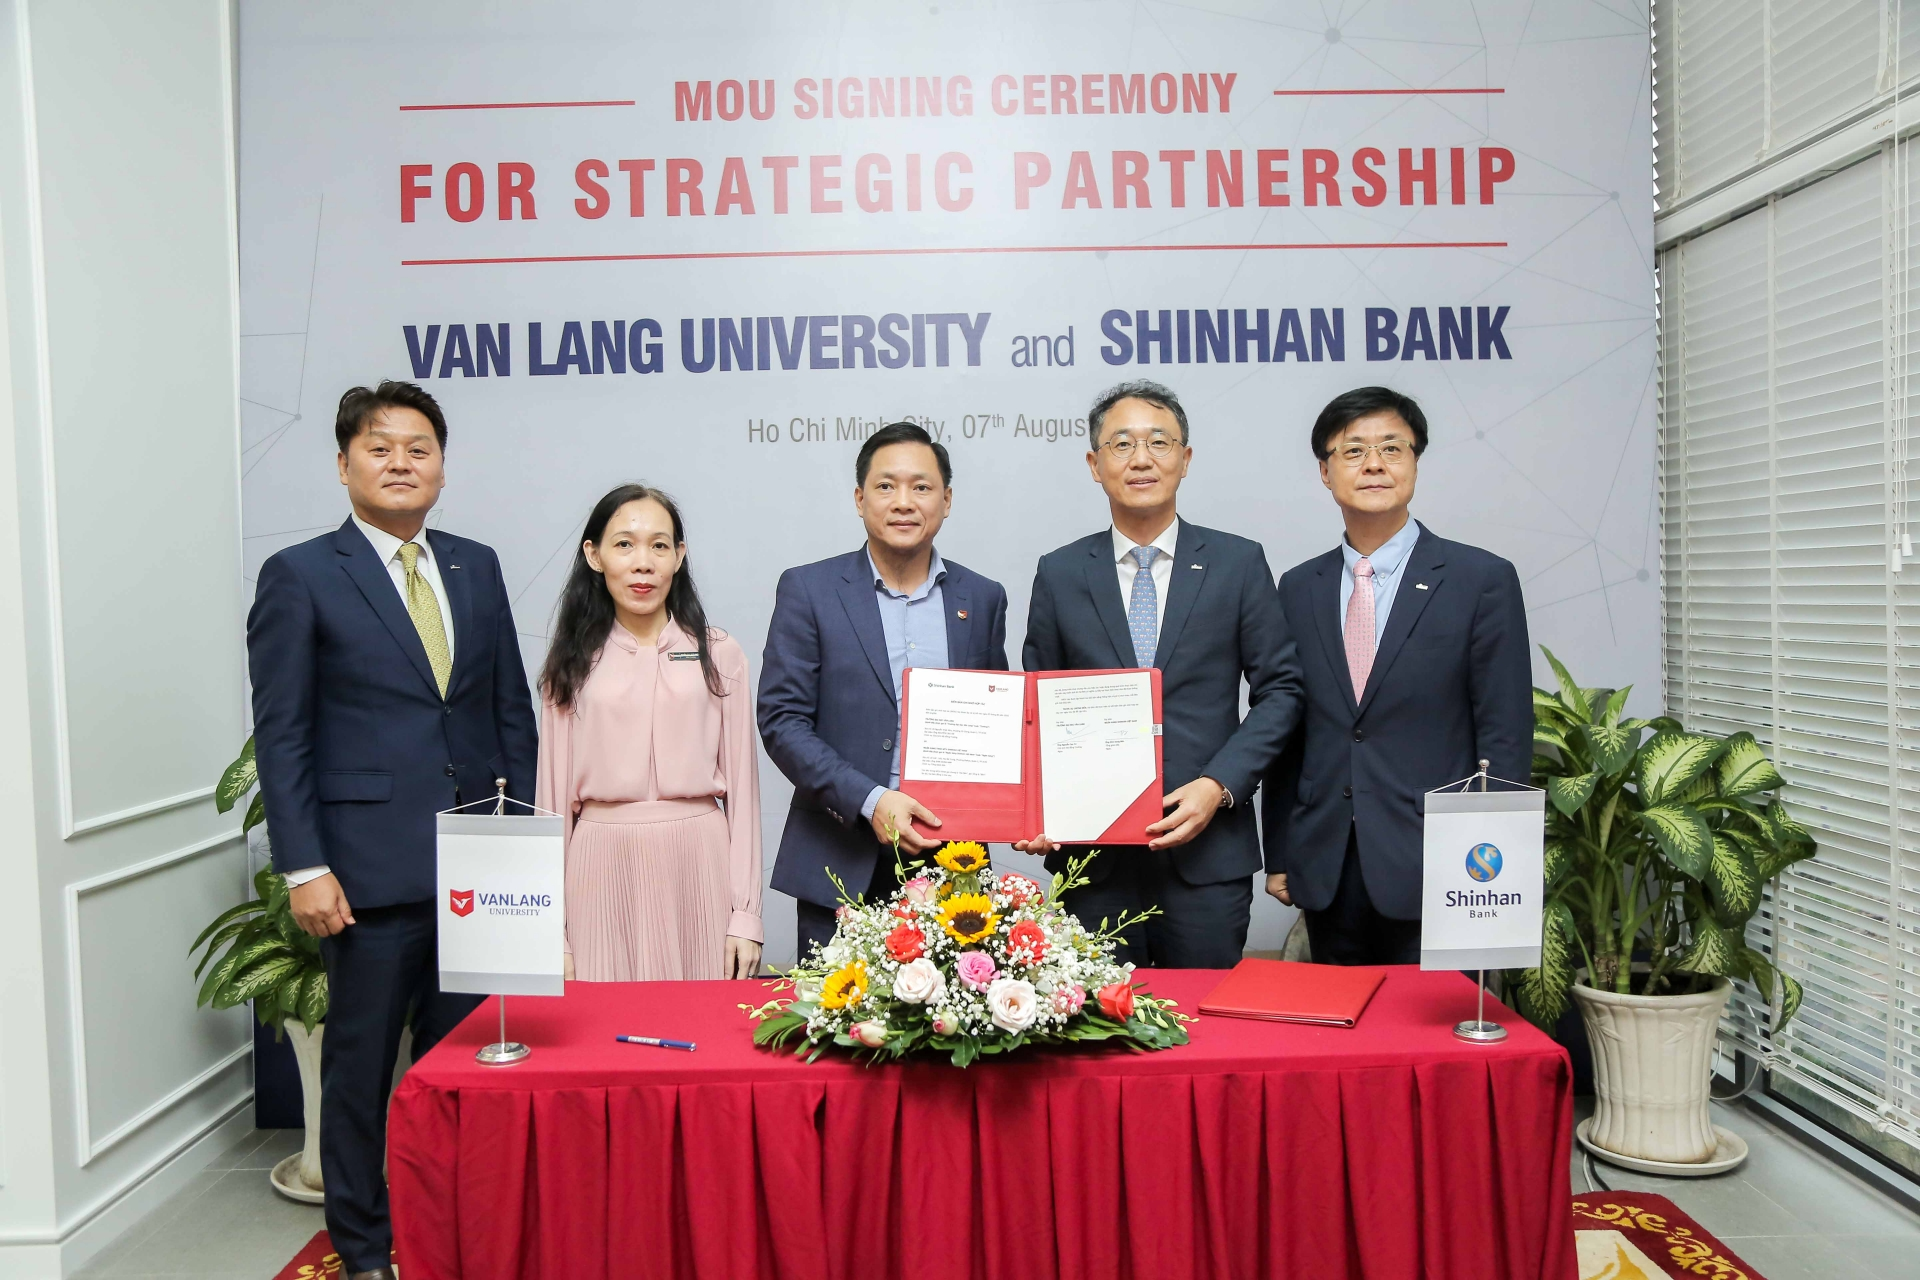 Shinhan Bank Vietnam and Van Lang University sign comprehensive partnership agreement